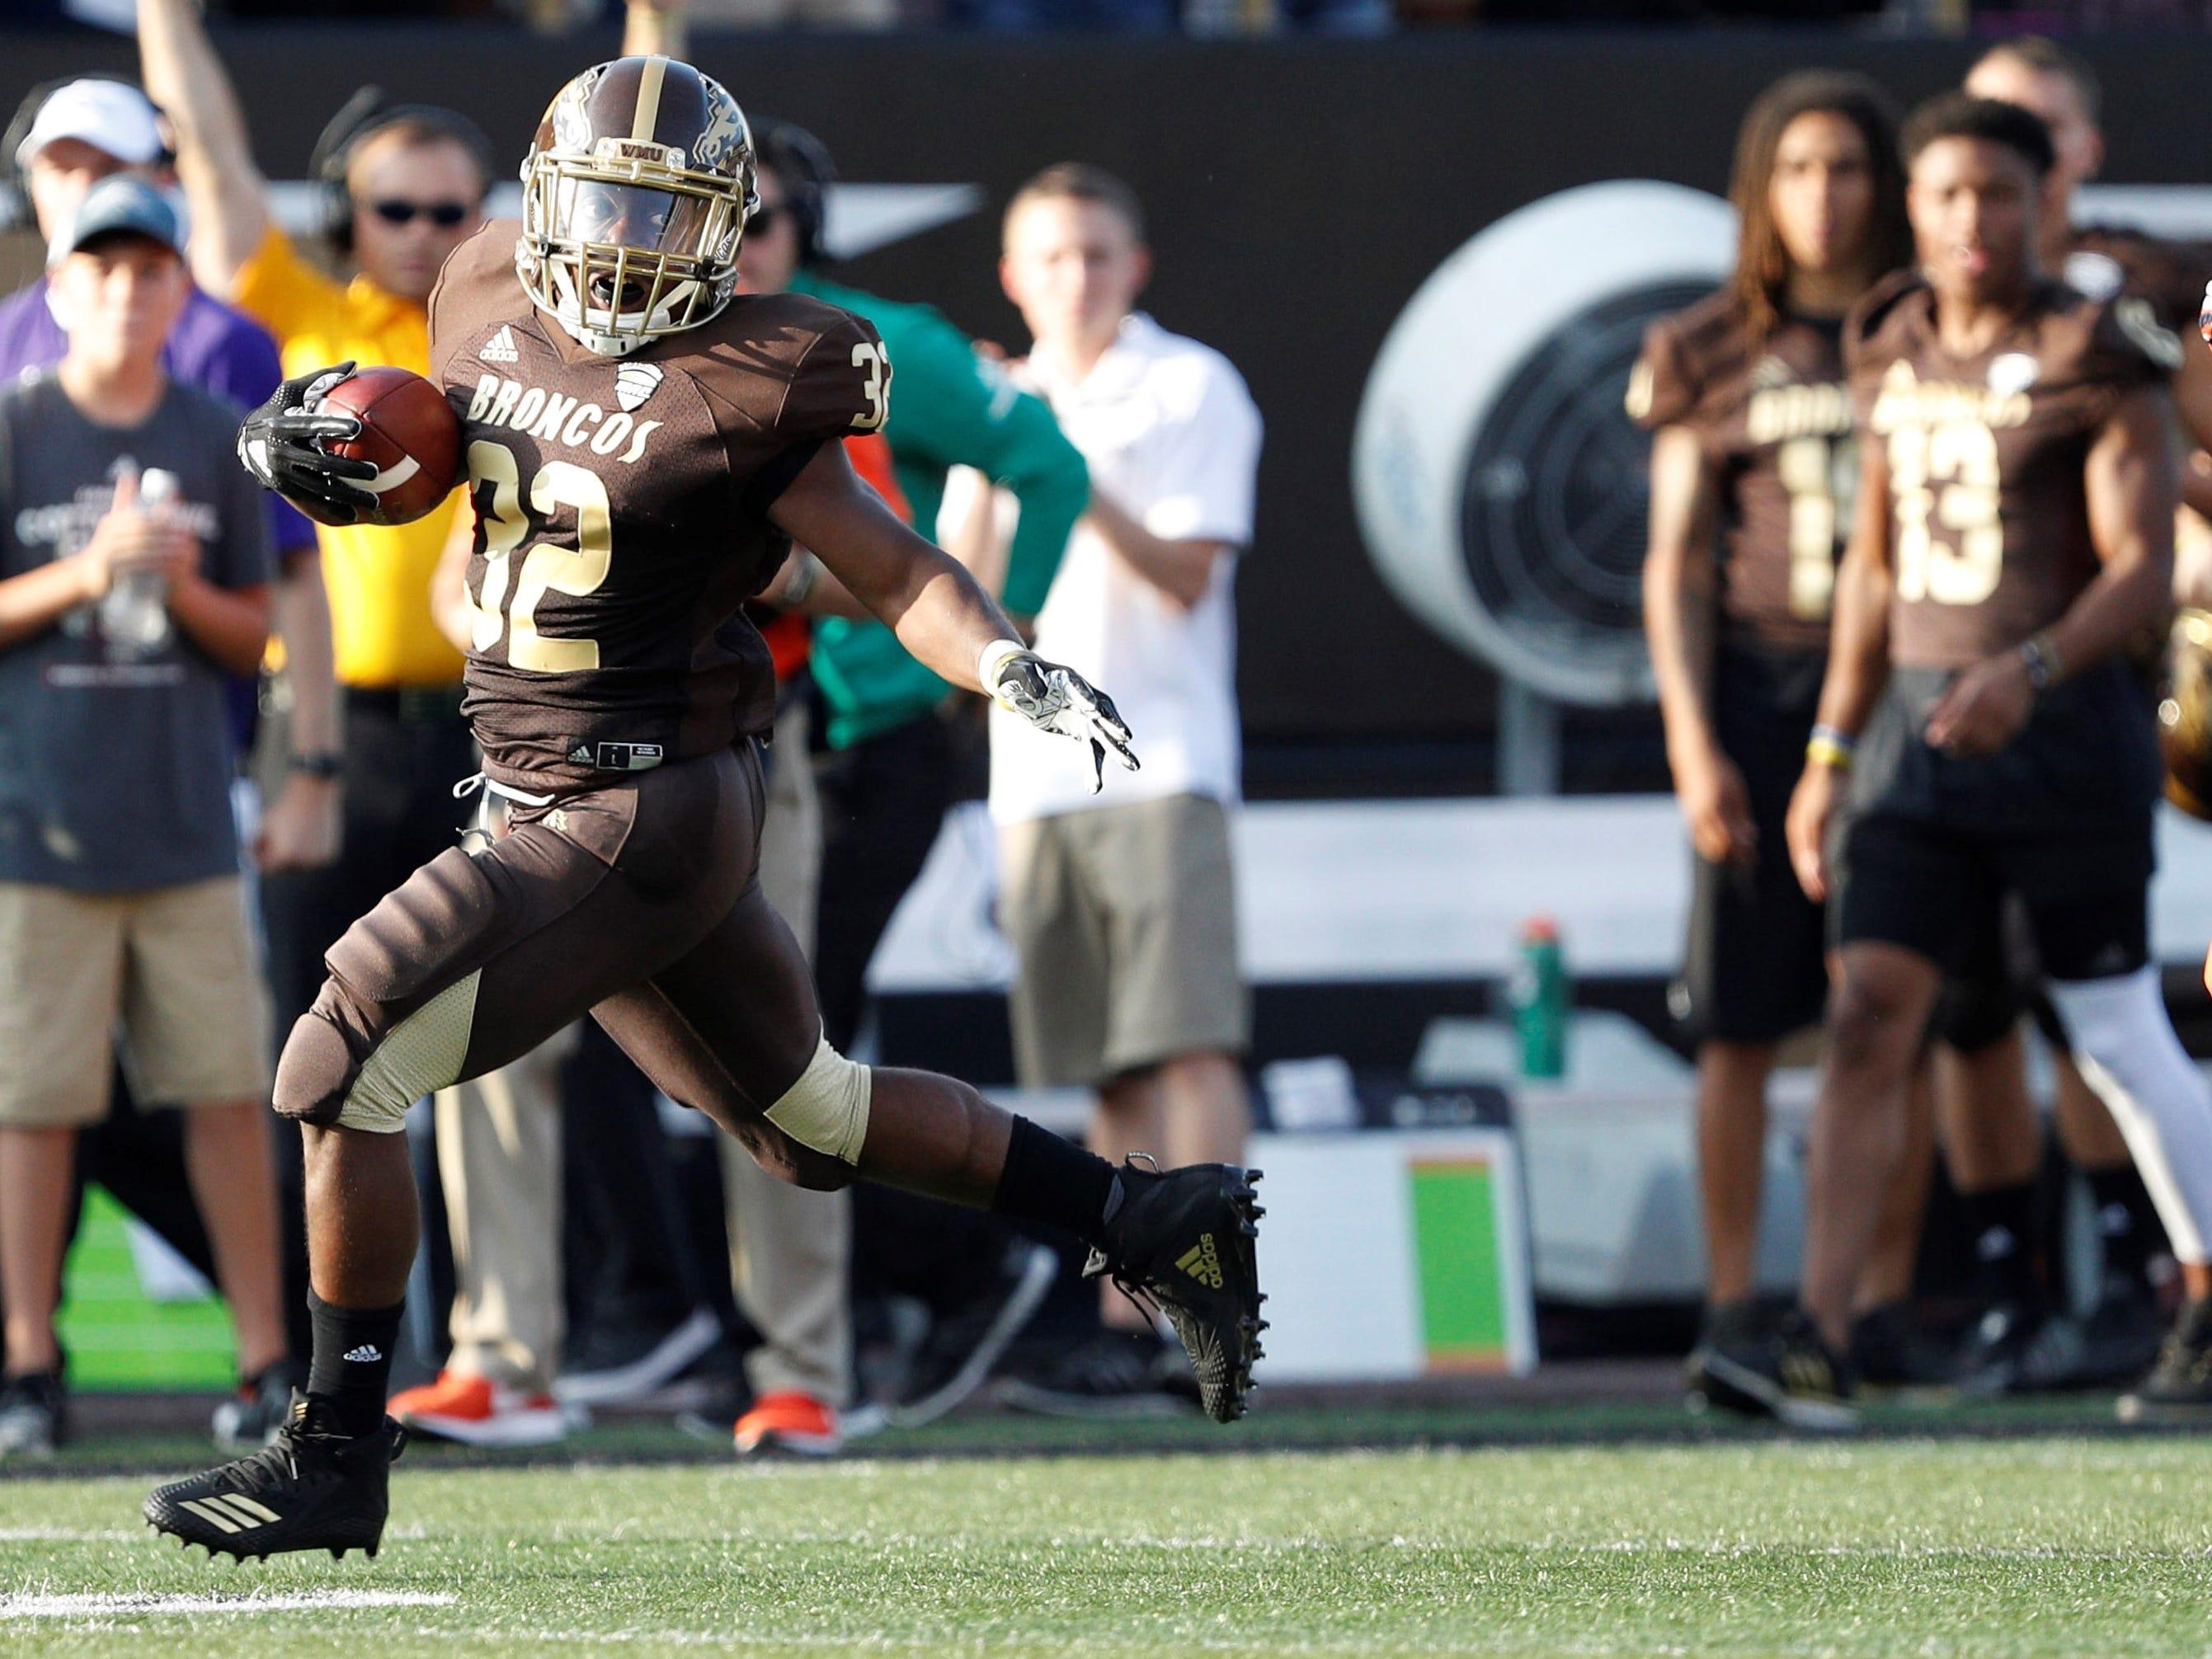 Western Michigan football: Jamauri Bogan's 4 TDs help Broncos stay unbeaten in MAC